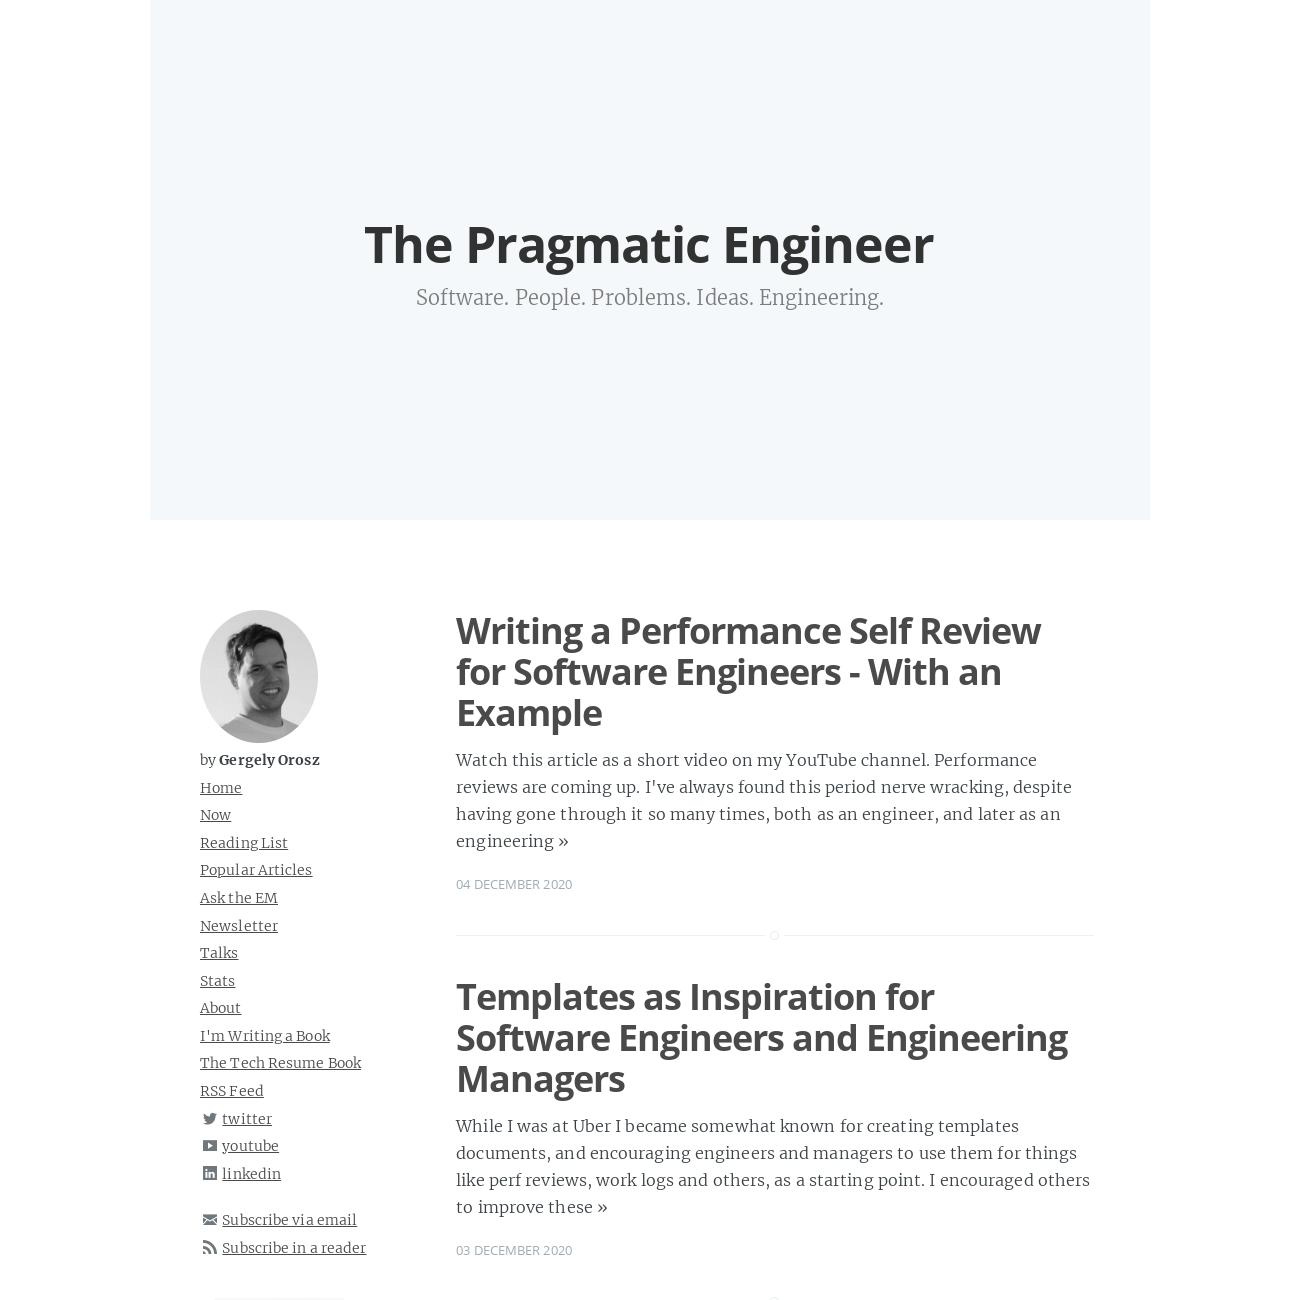 The Pragmatic Engineer